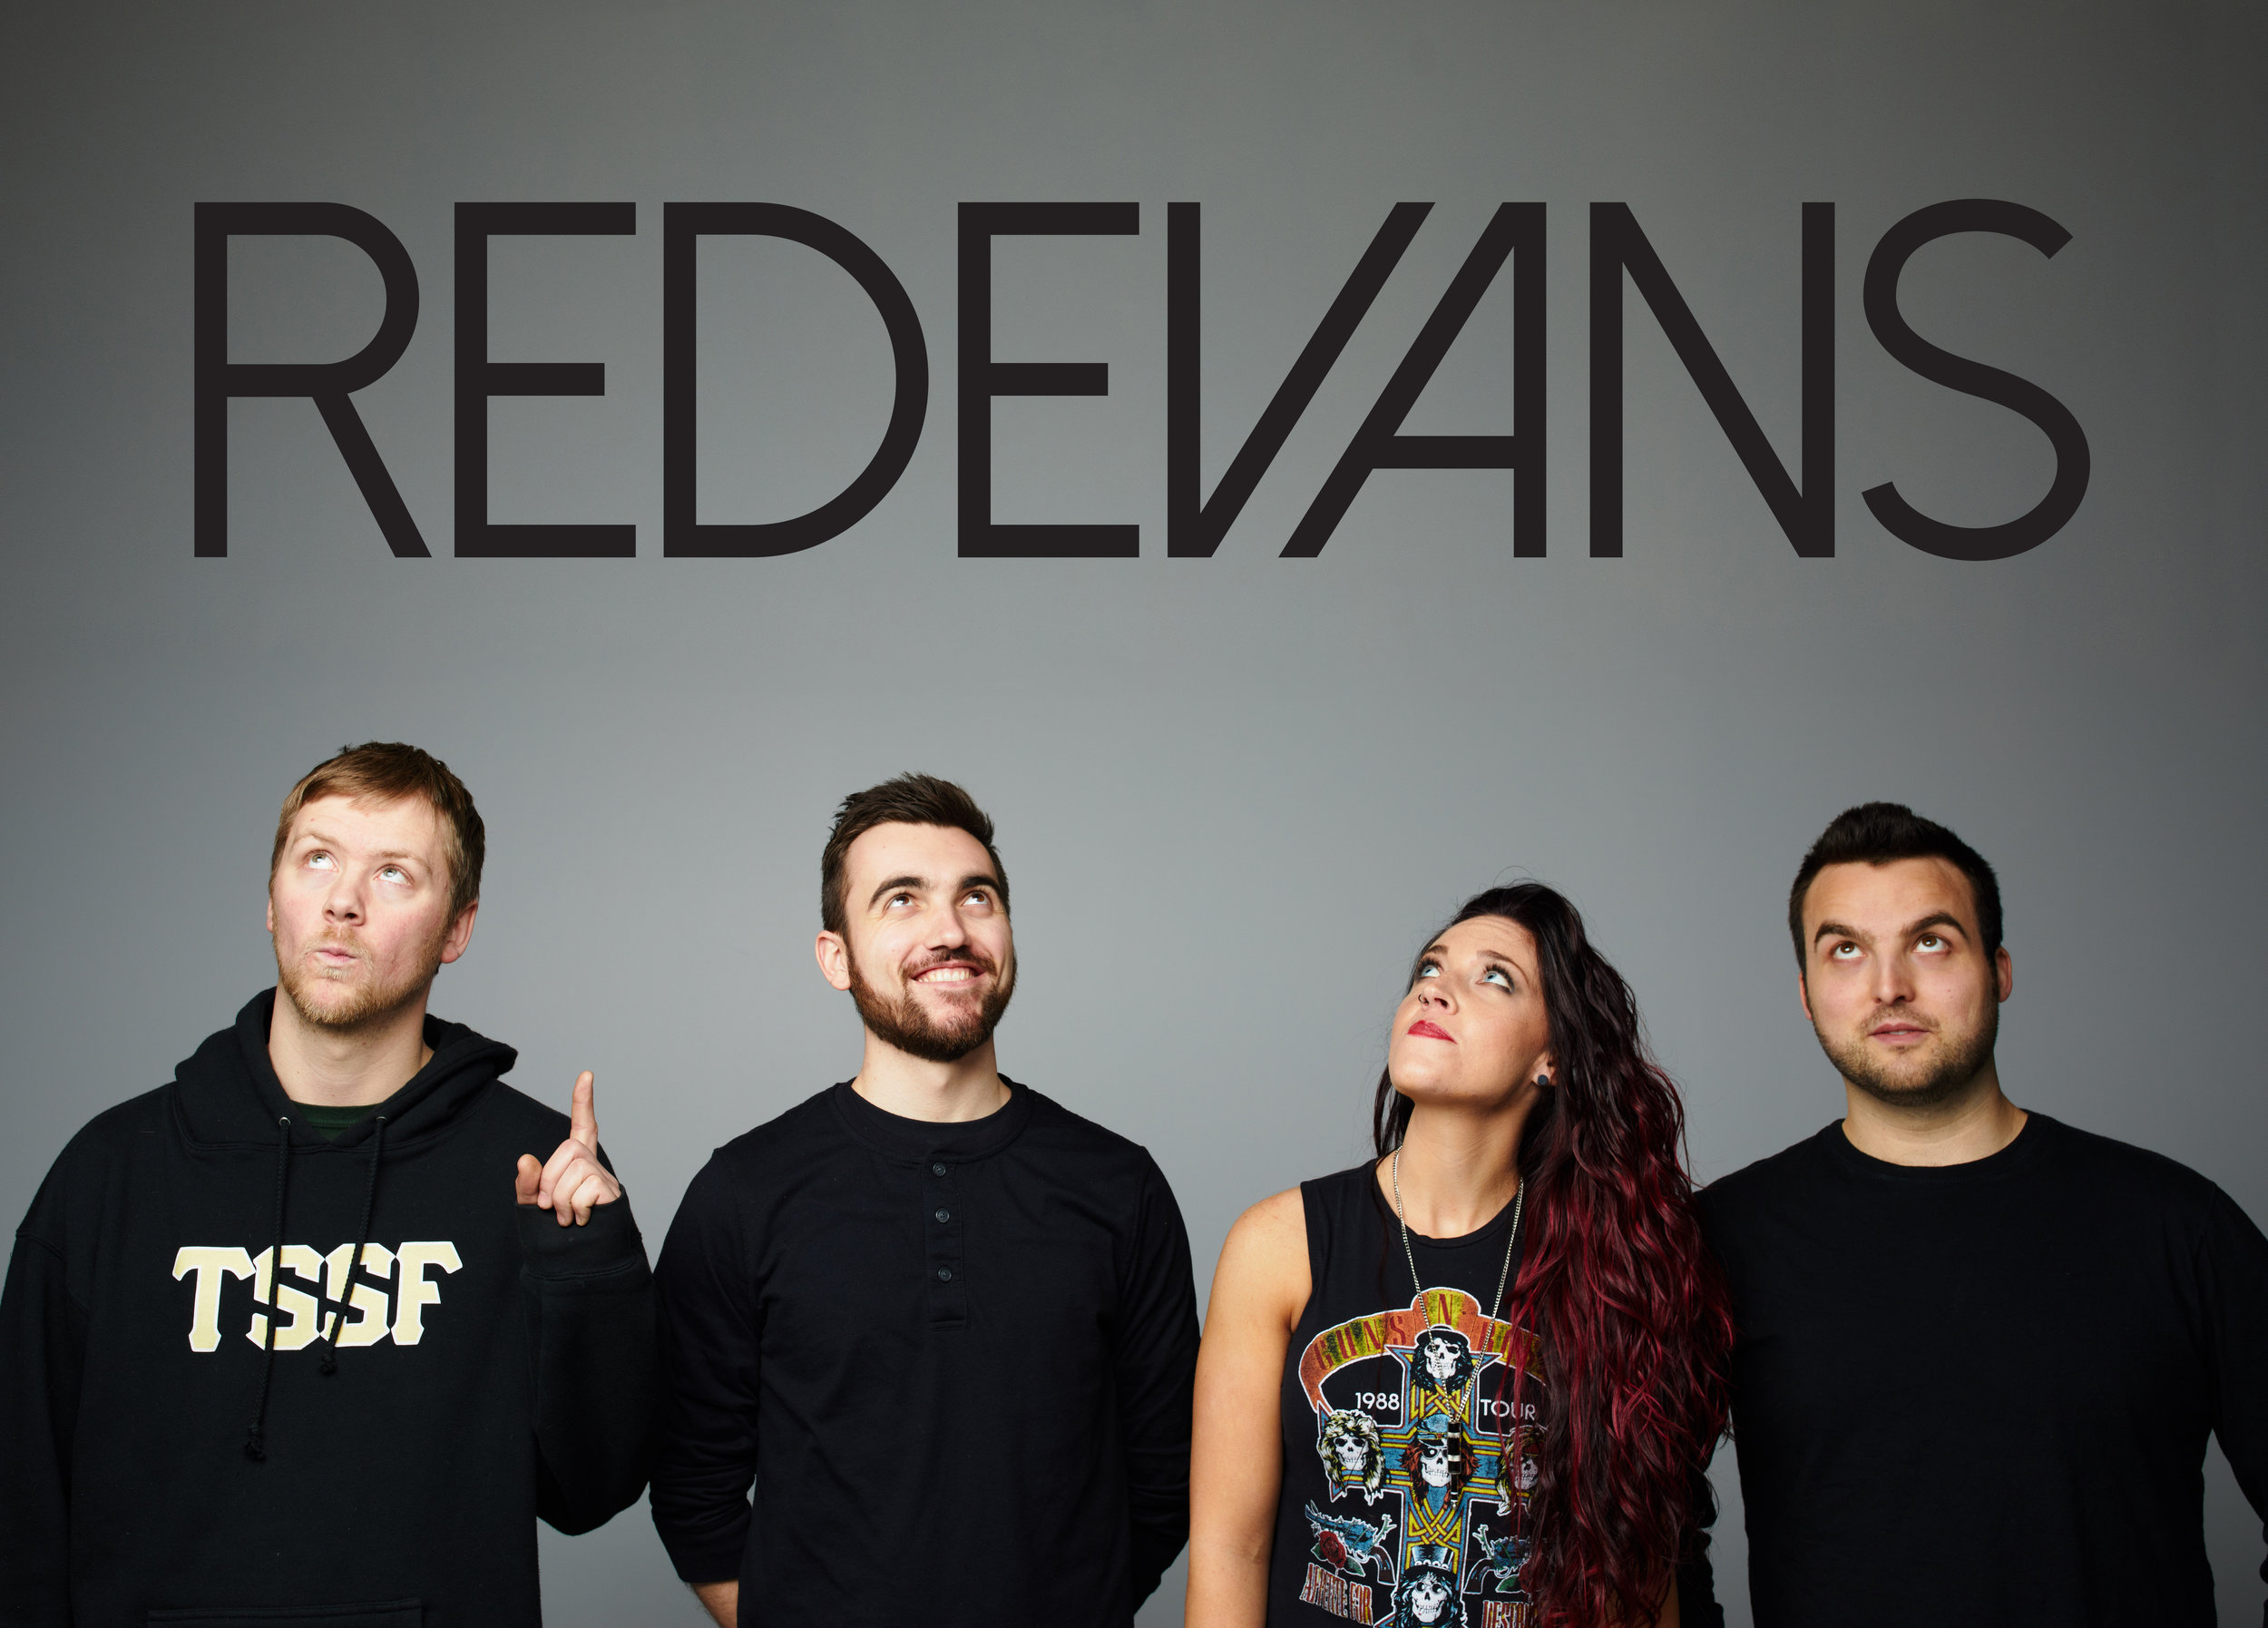 Redevans-Promo-Image-Logo-2.jpg